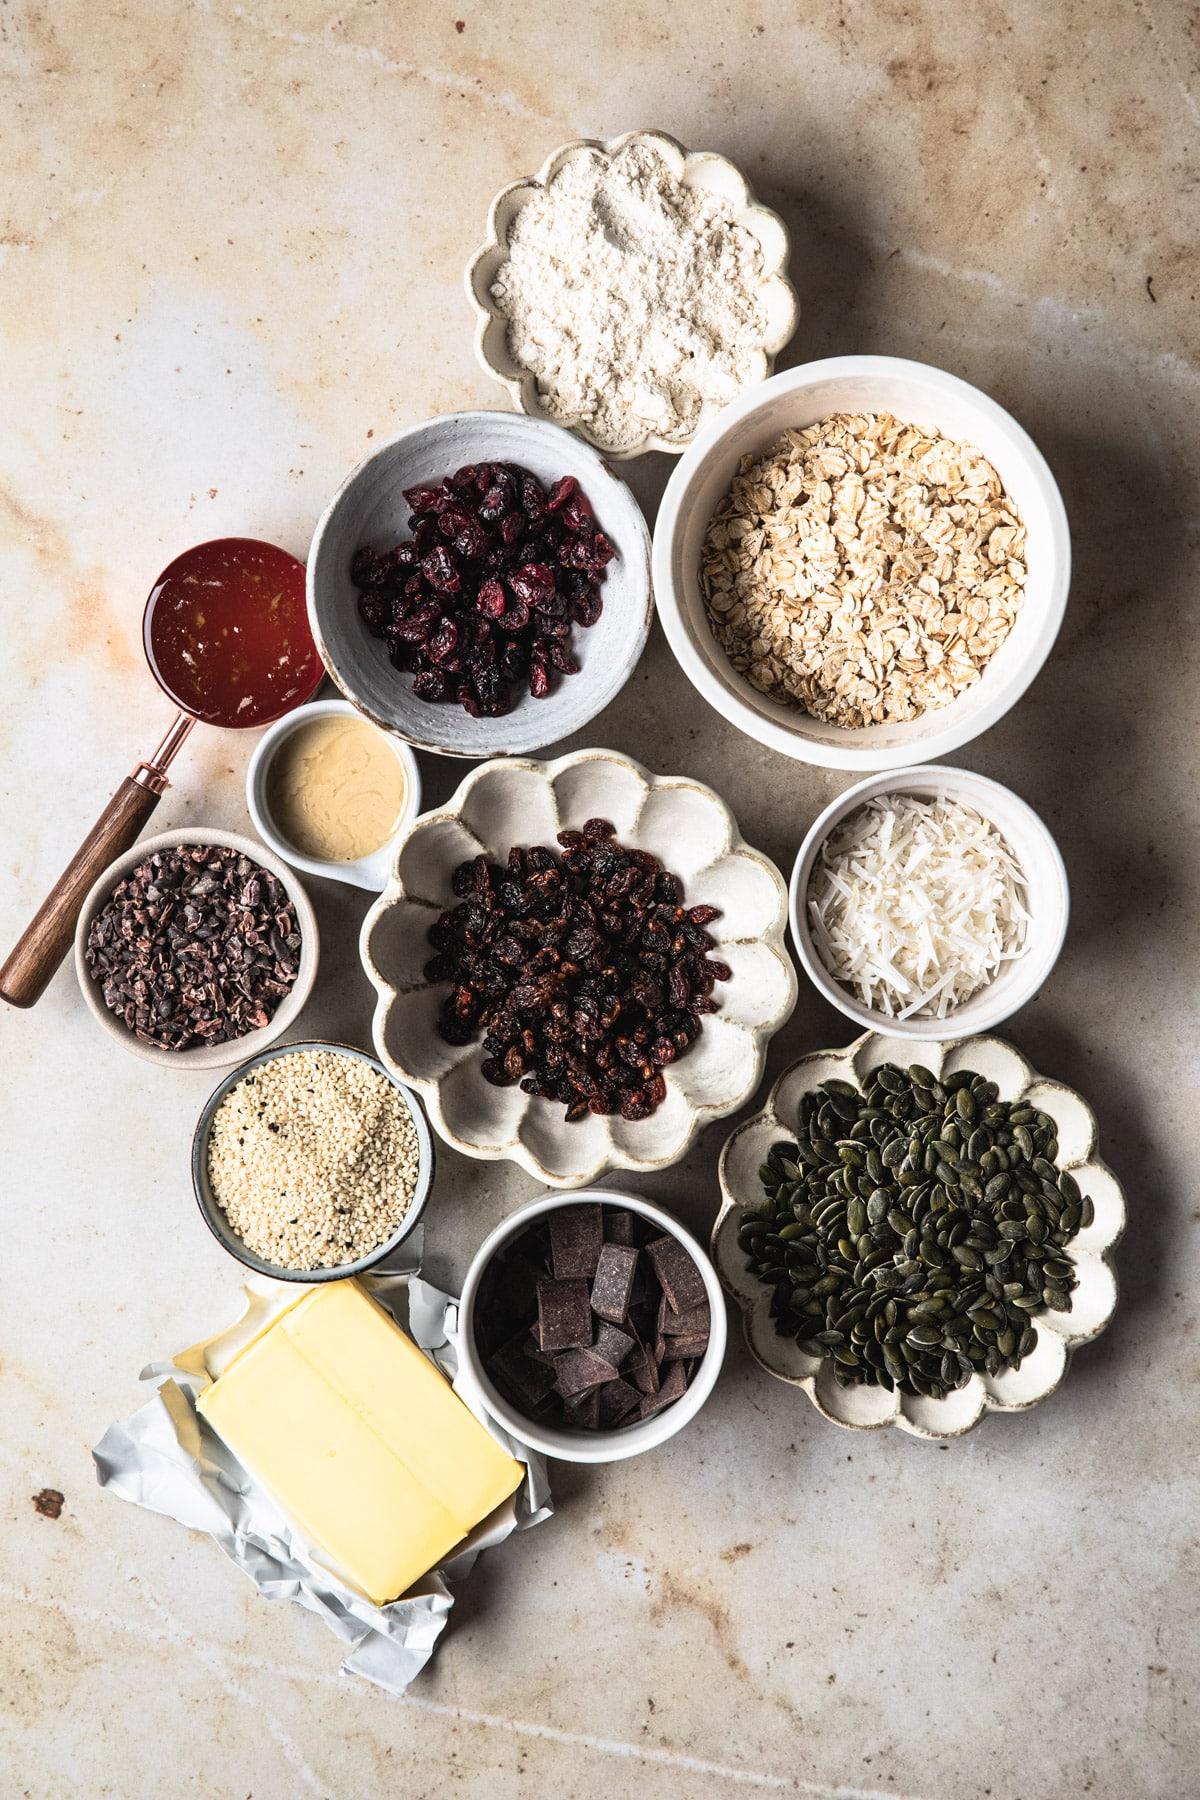 ingredients for muesli slice